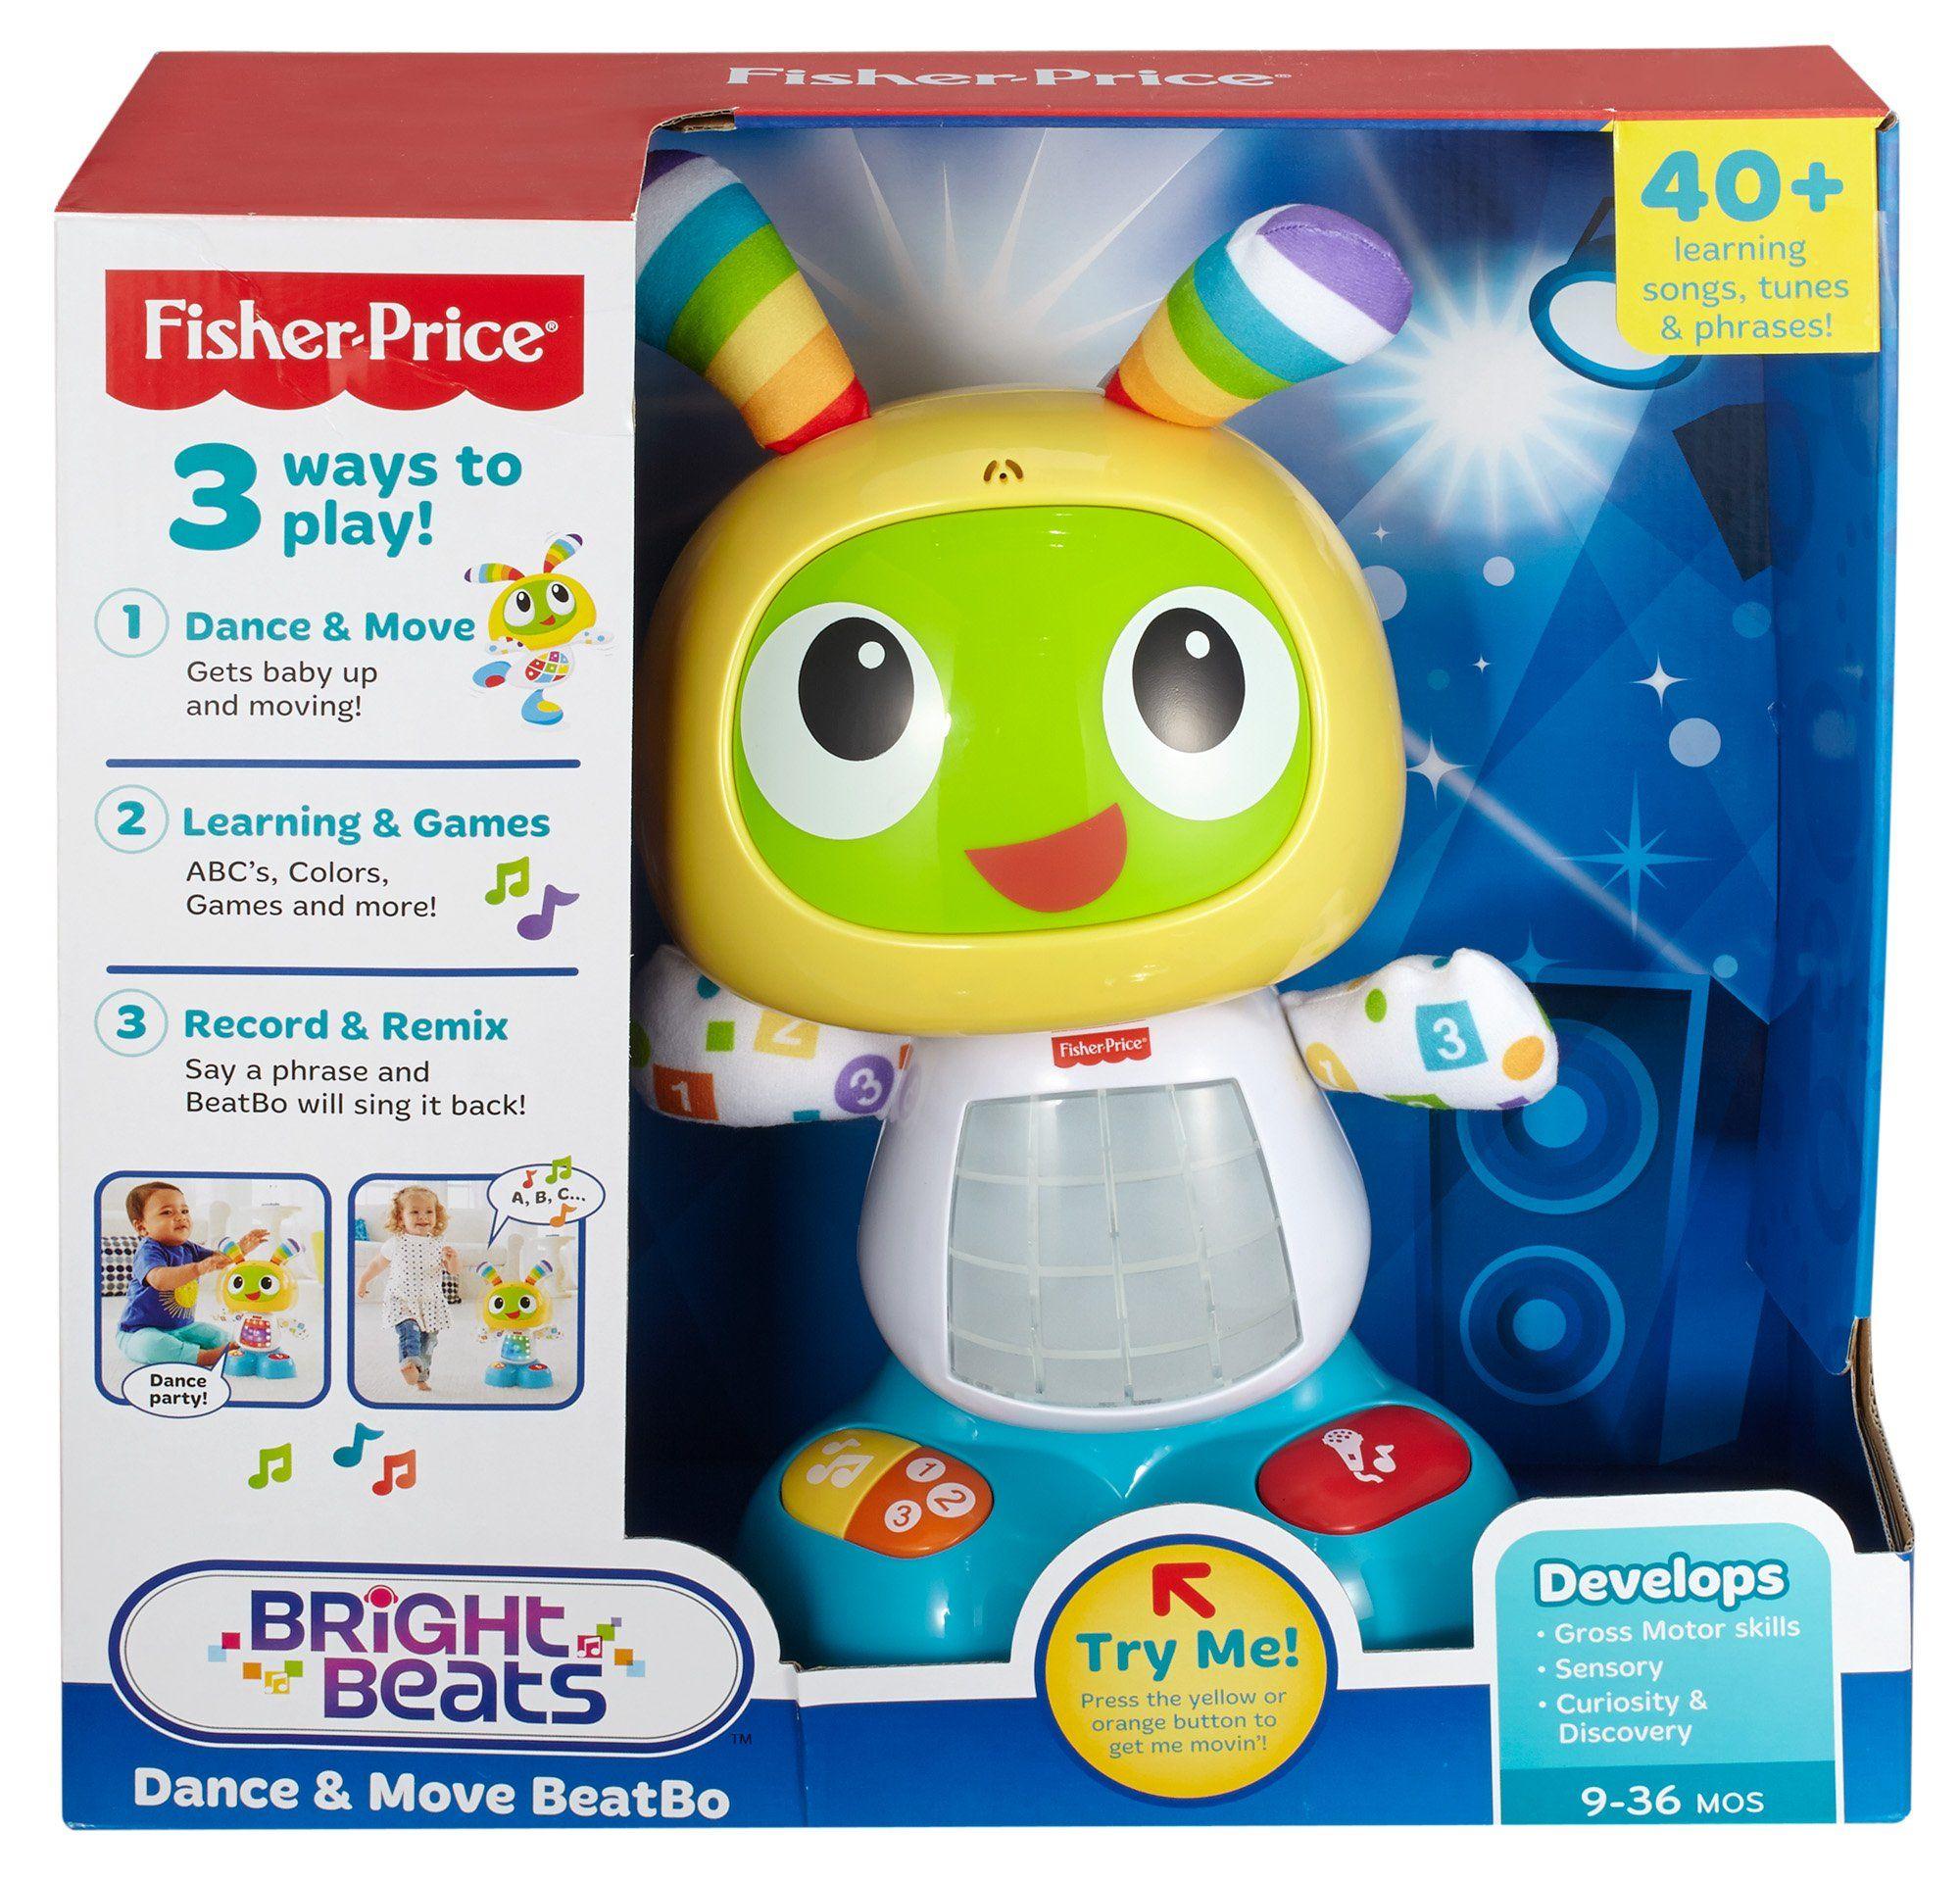 Amazon Fisher Price Bright Beats Dance & Move BeatBo Toys